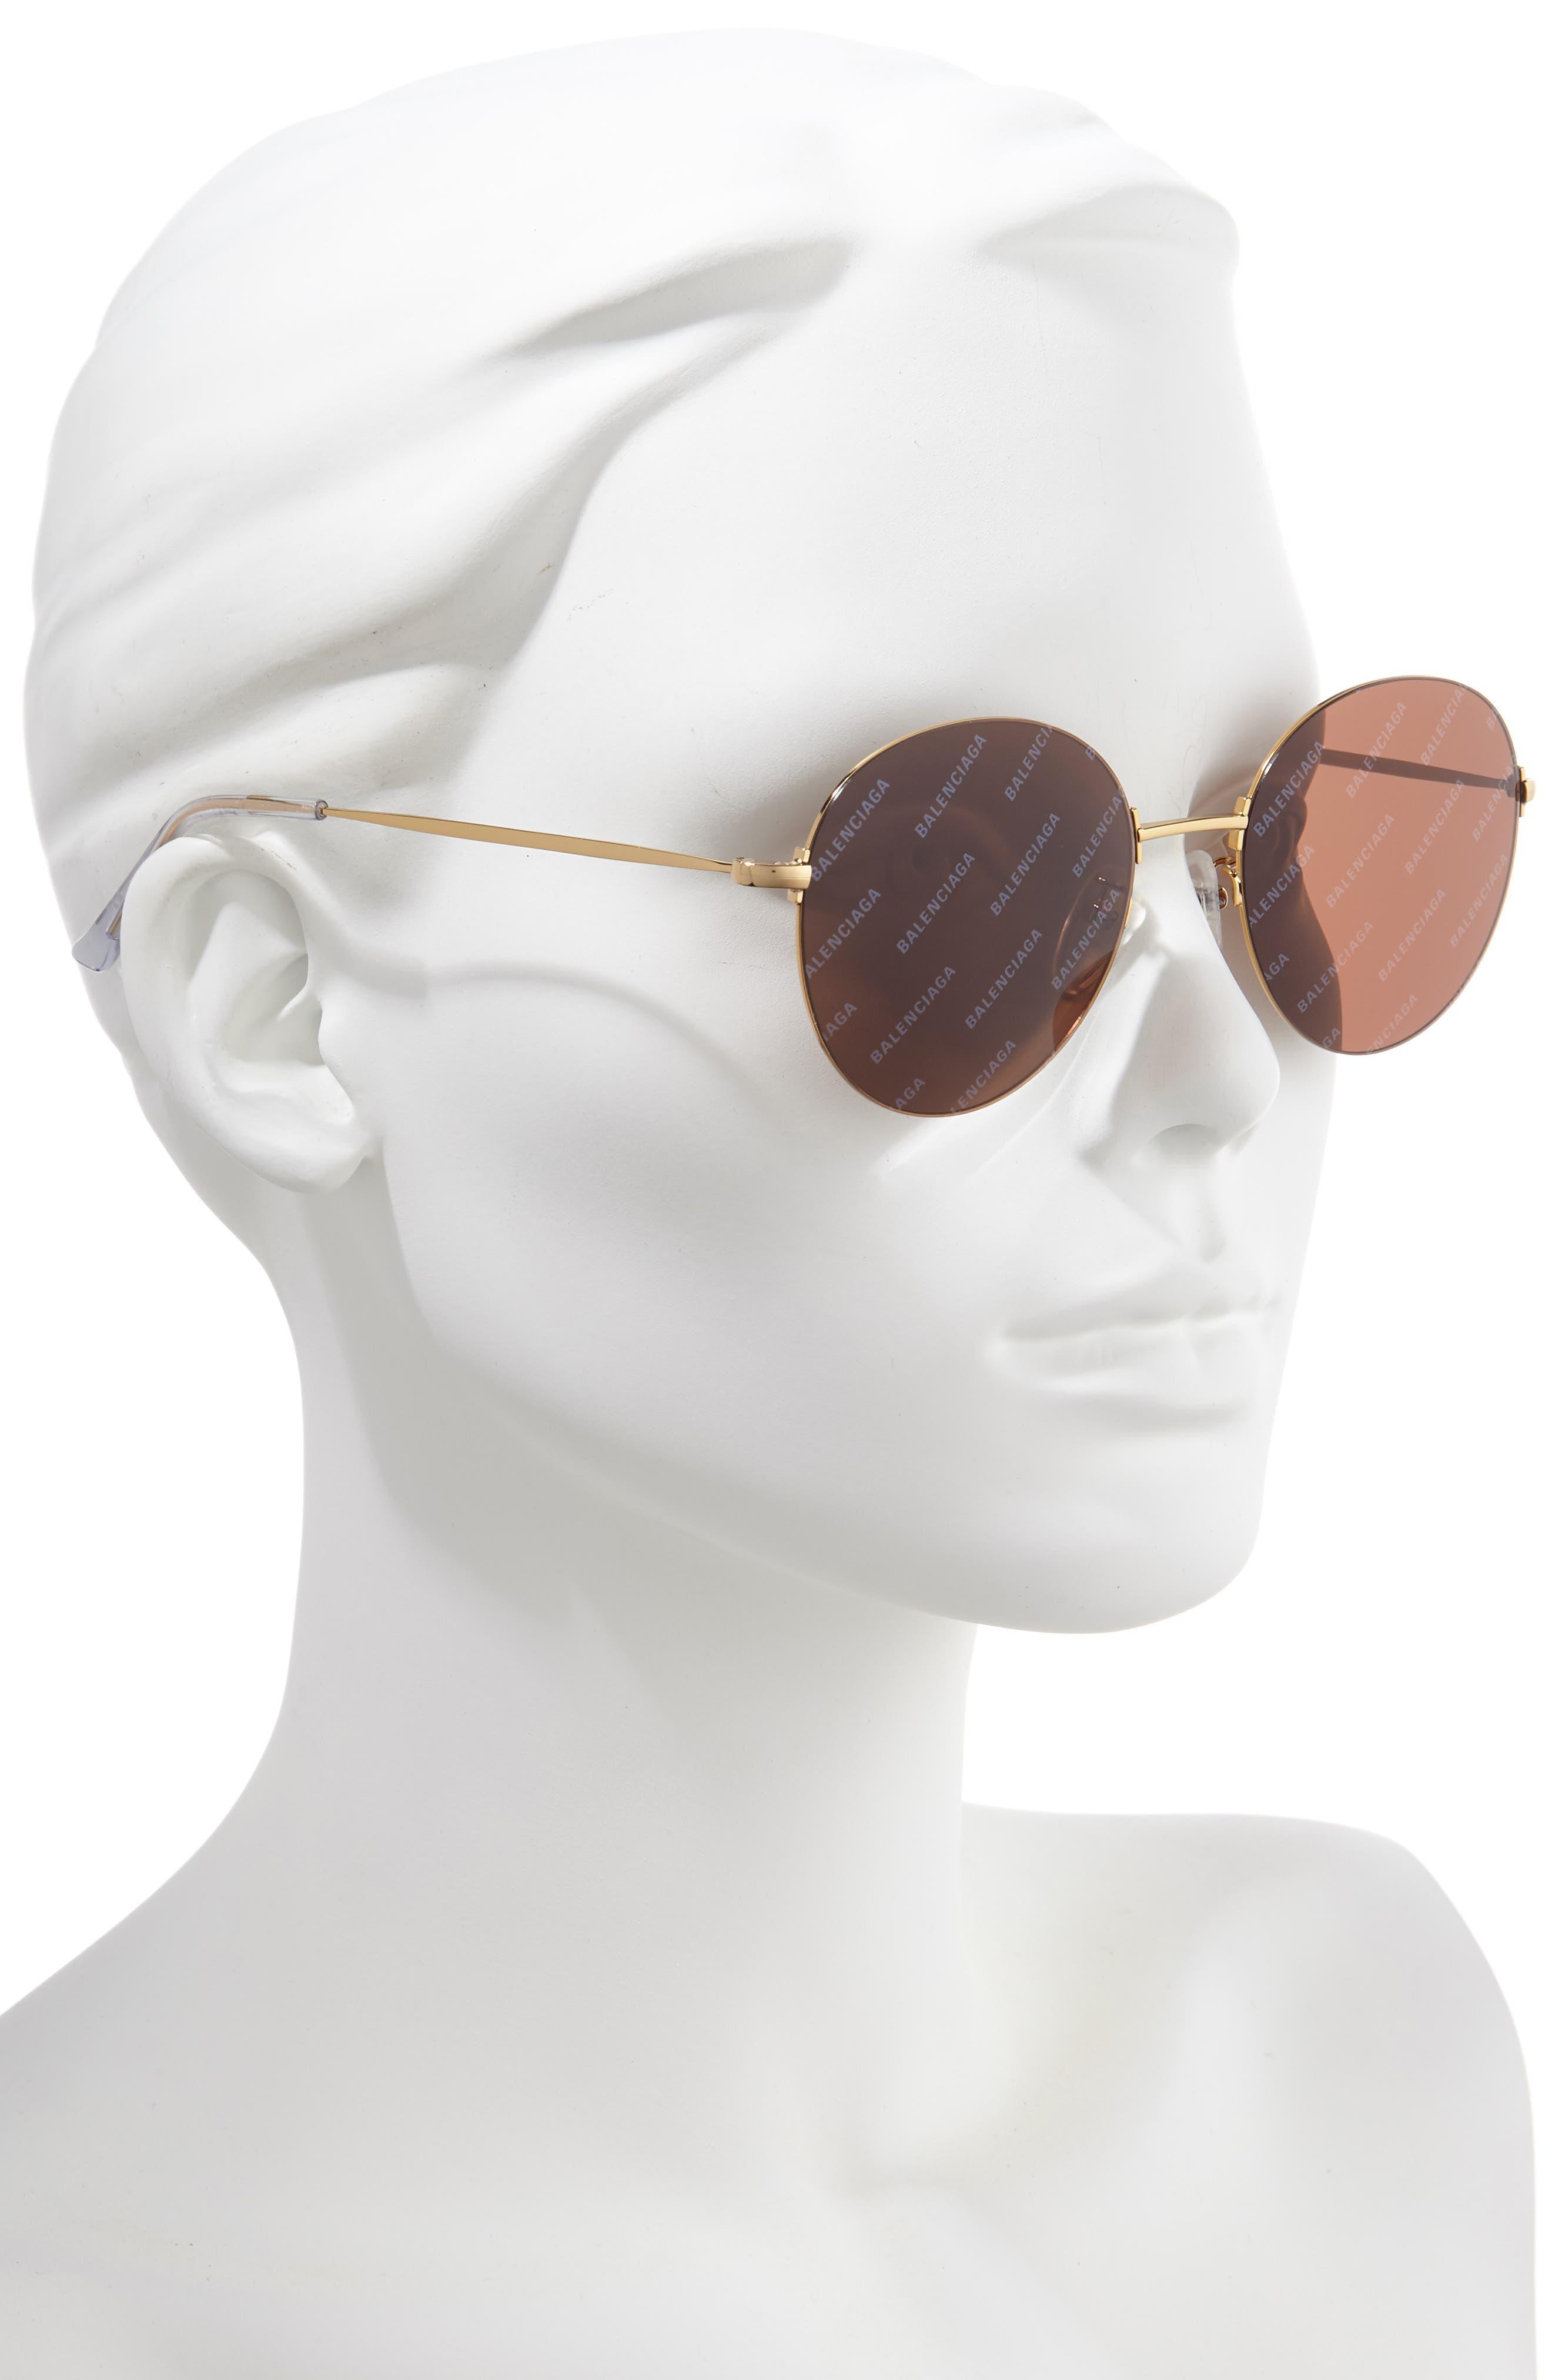 BALENCIAGA, 55mm Round Sunglasses, Alternate thumbnail 2, color, SHINY ENDURA GOLD/ BROWN